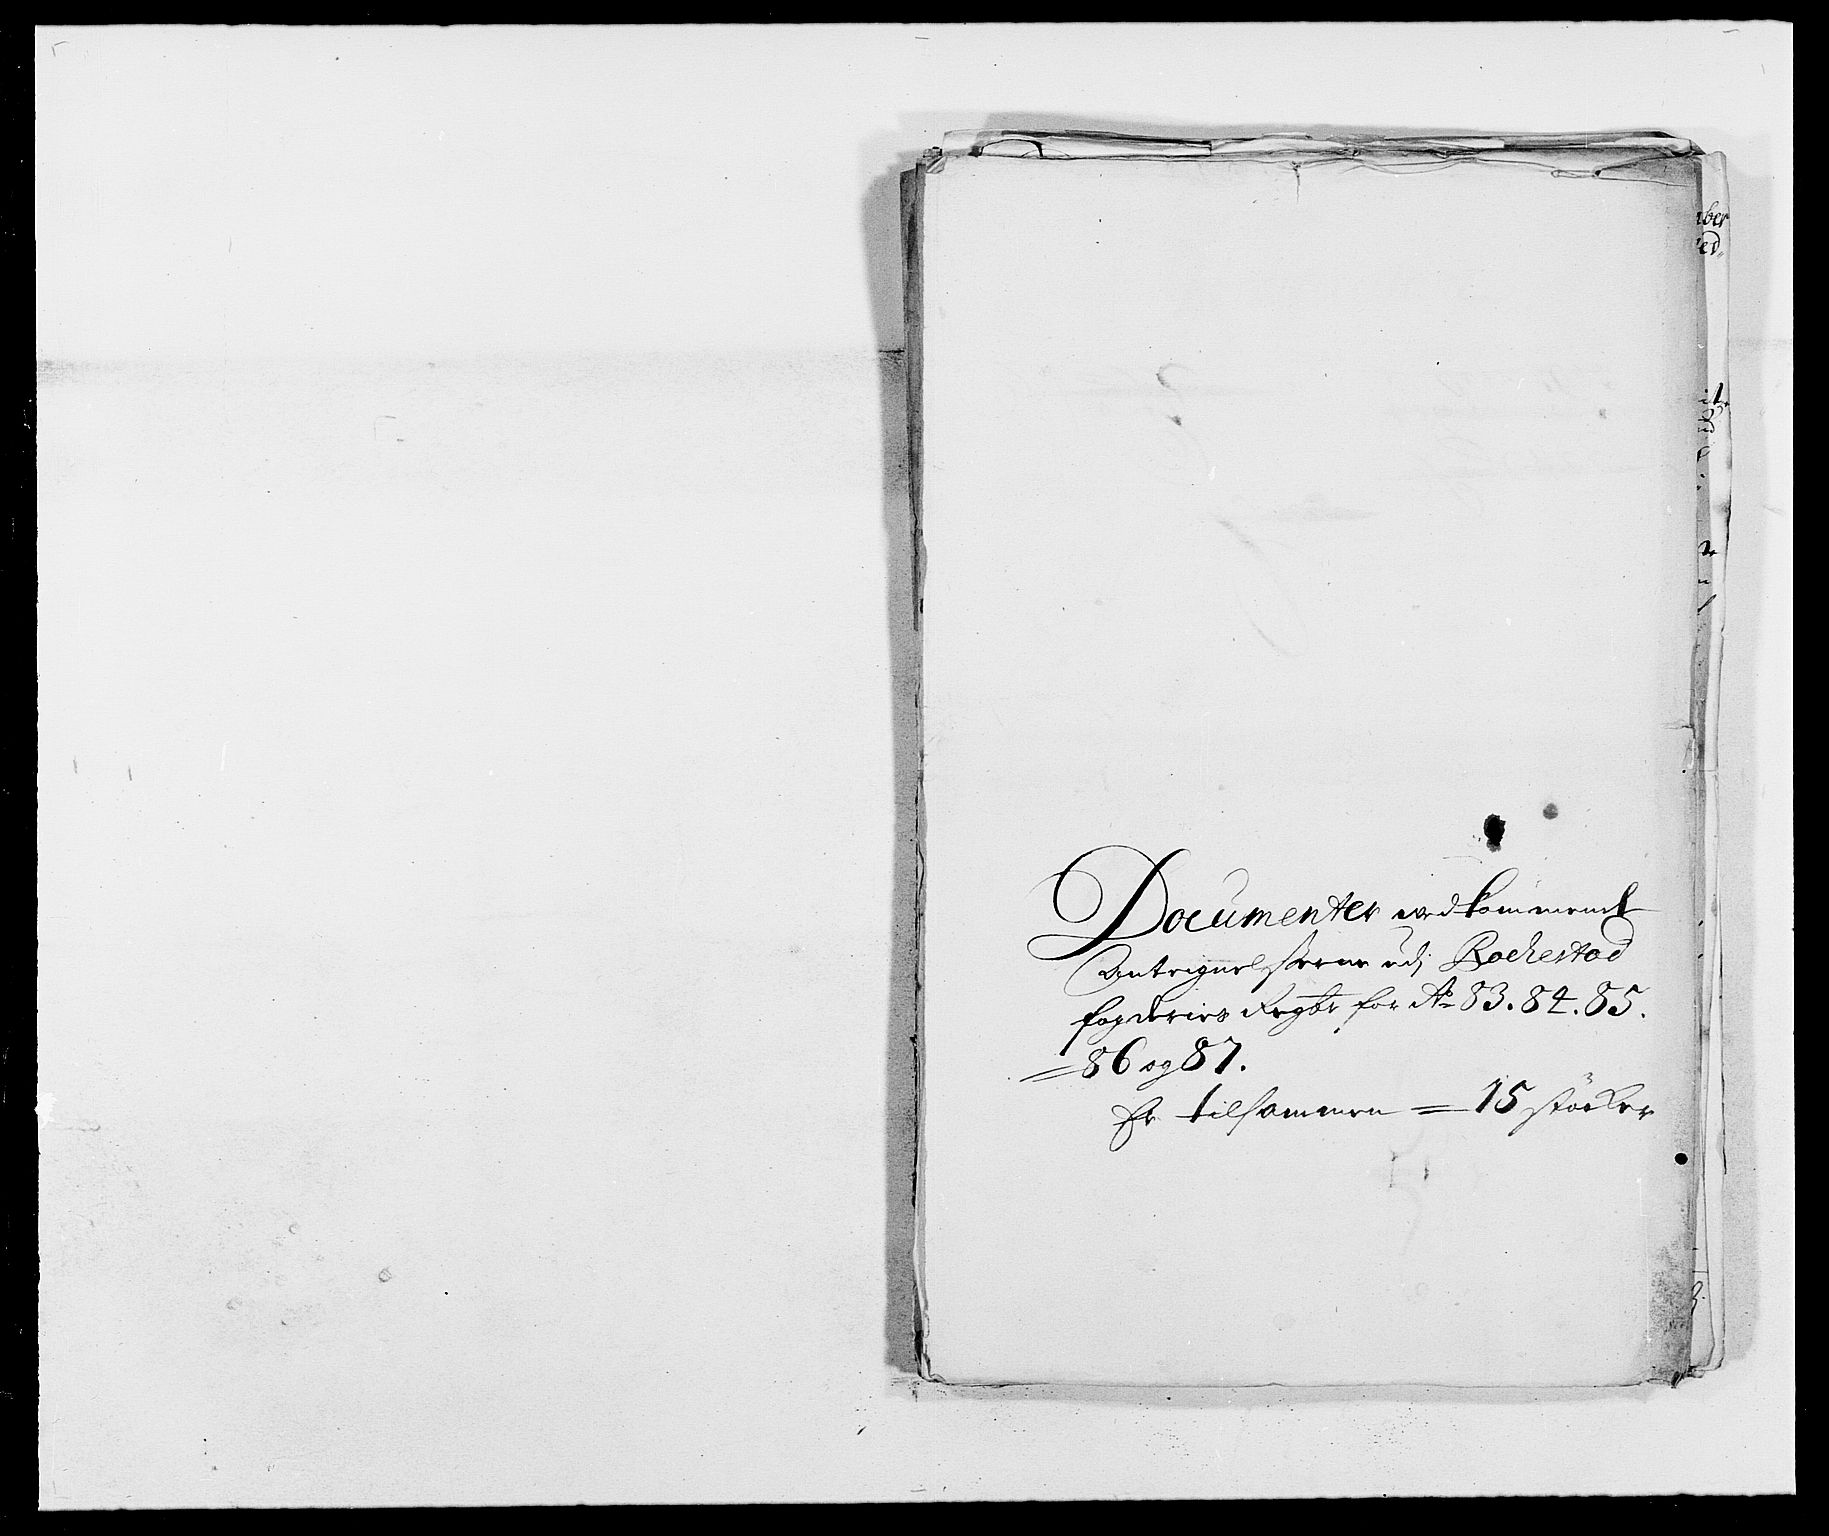 RA, Rentekammeret inntil 1814, Reviderte regnskaper, Fogderegnskap, R05/L0276: Fogderegnskap Rakkestad, 1683-1688, s. 361